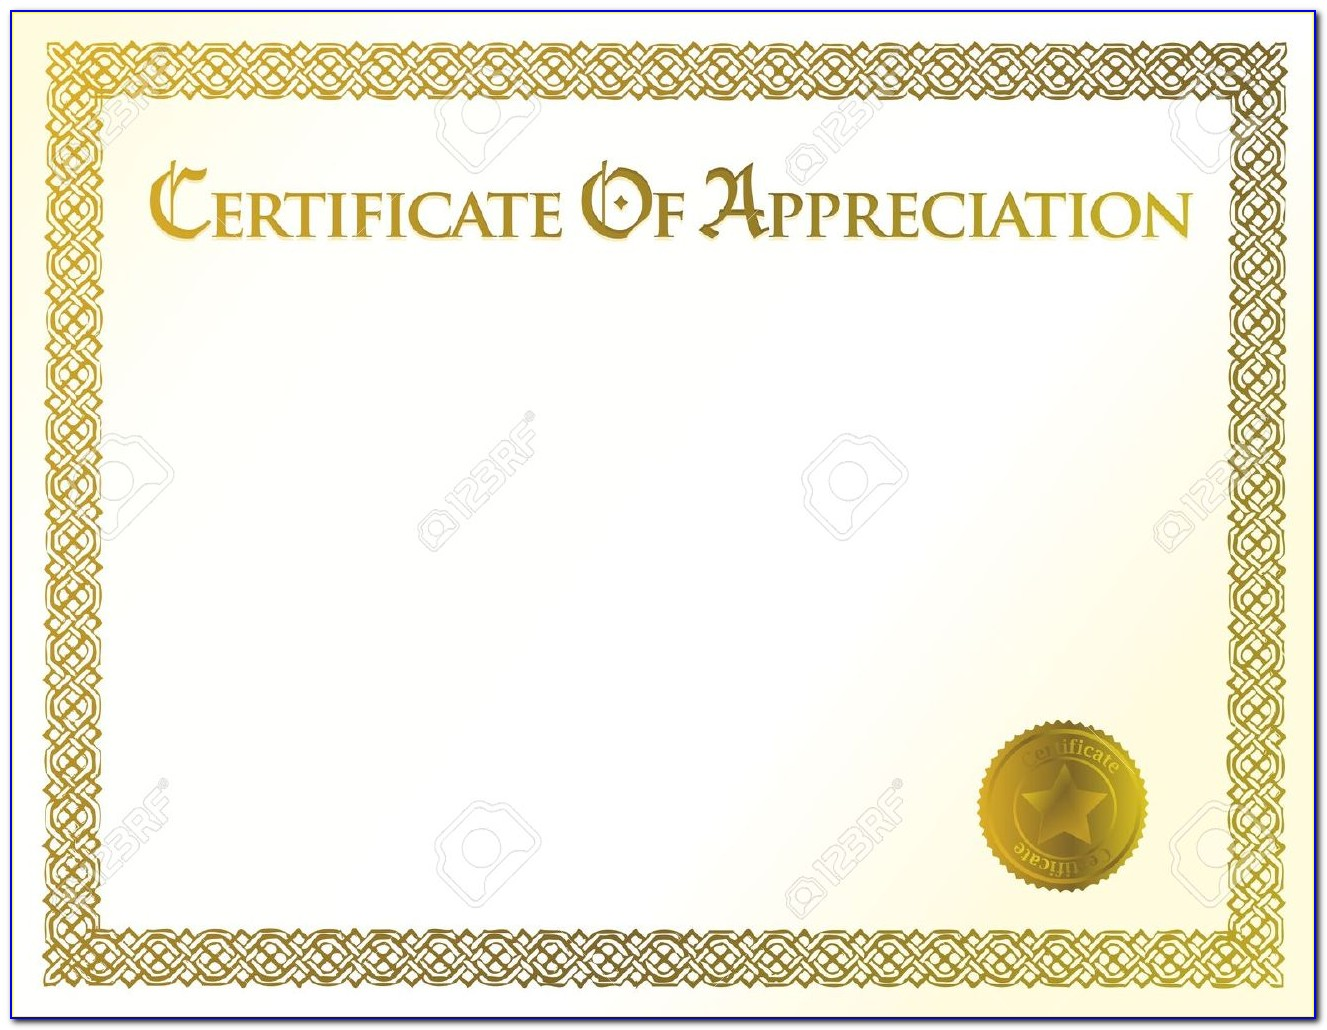 Appreciation Award Certificate Templates Free